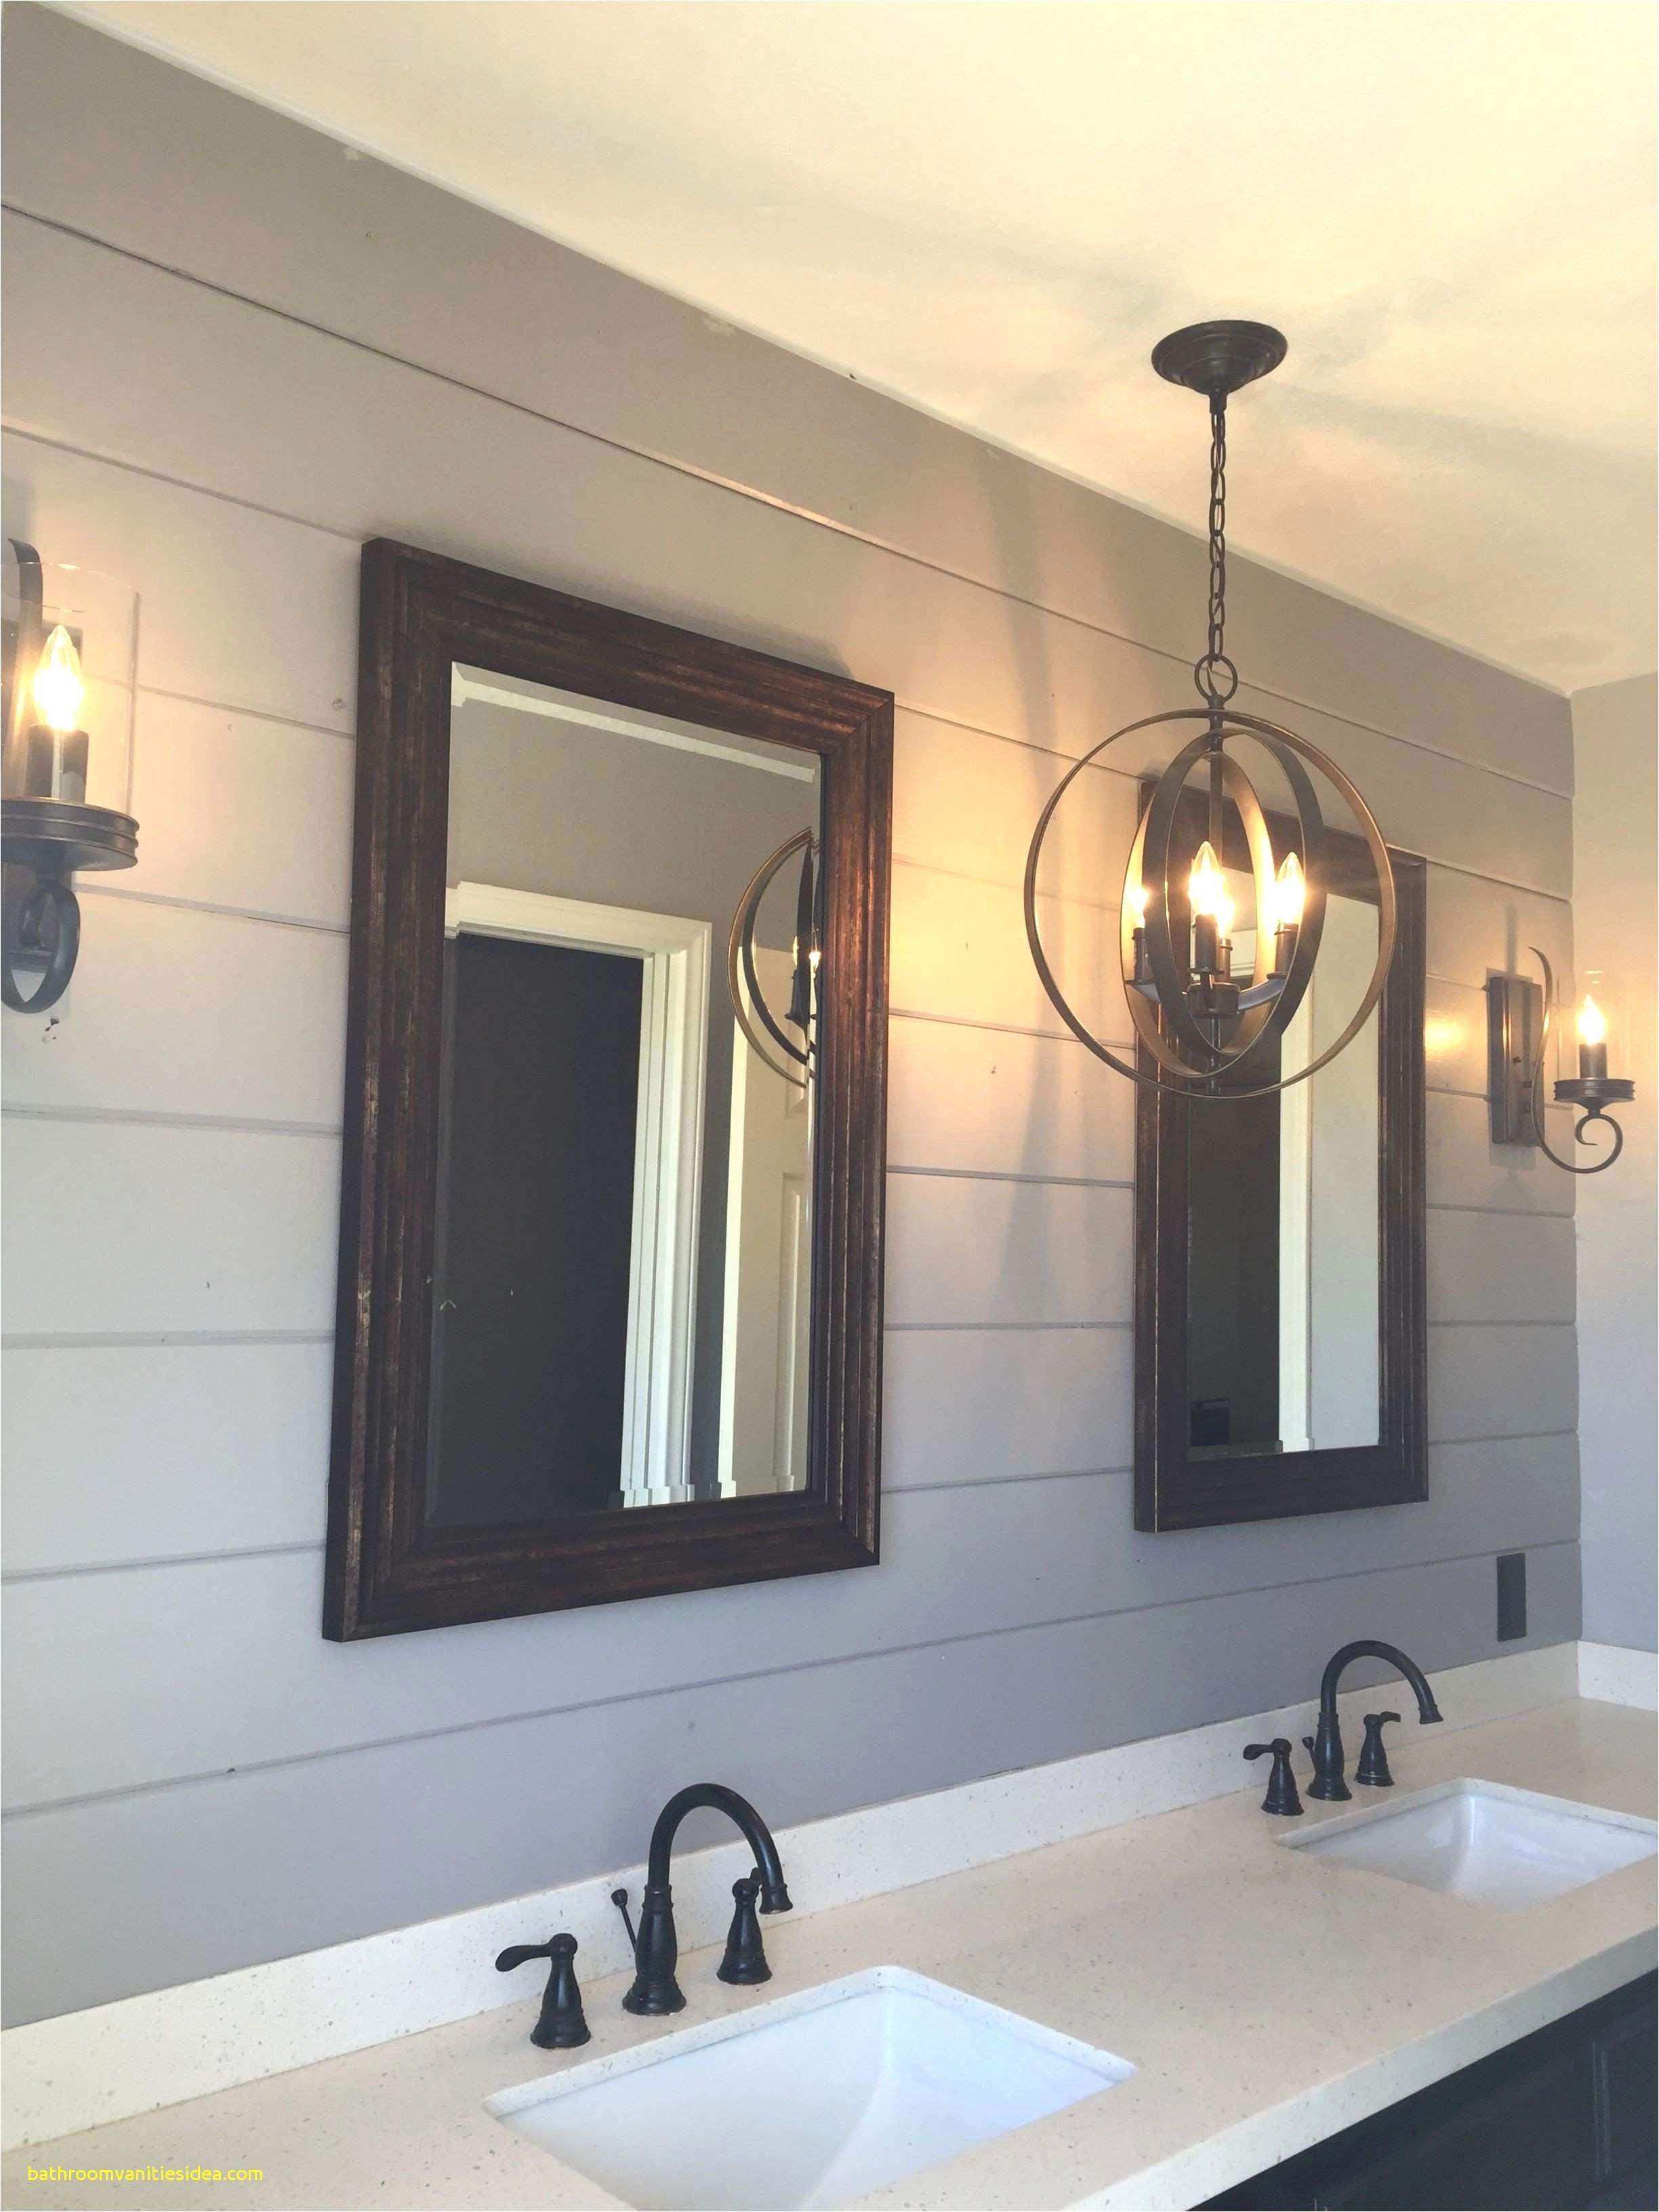 diy bathroom lighting bathroom vanity mirror inspirational diy light luxury h sink install i 0d